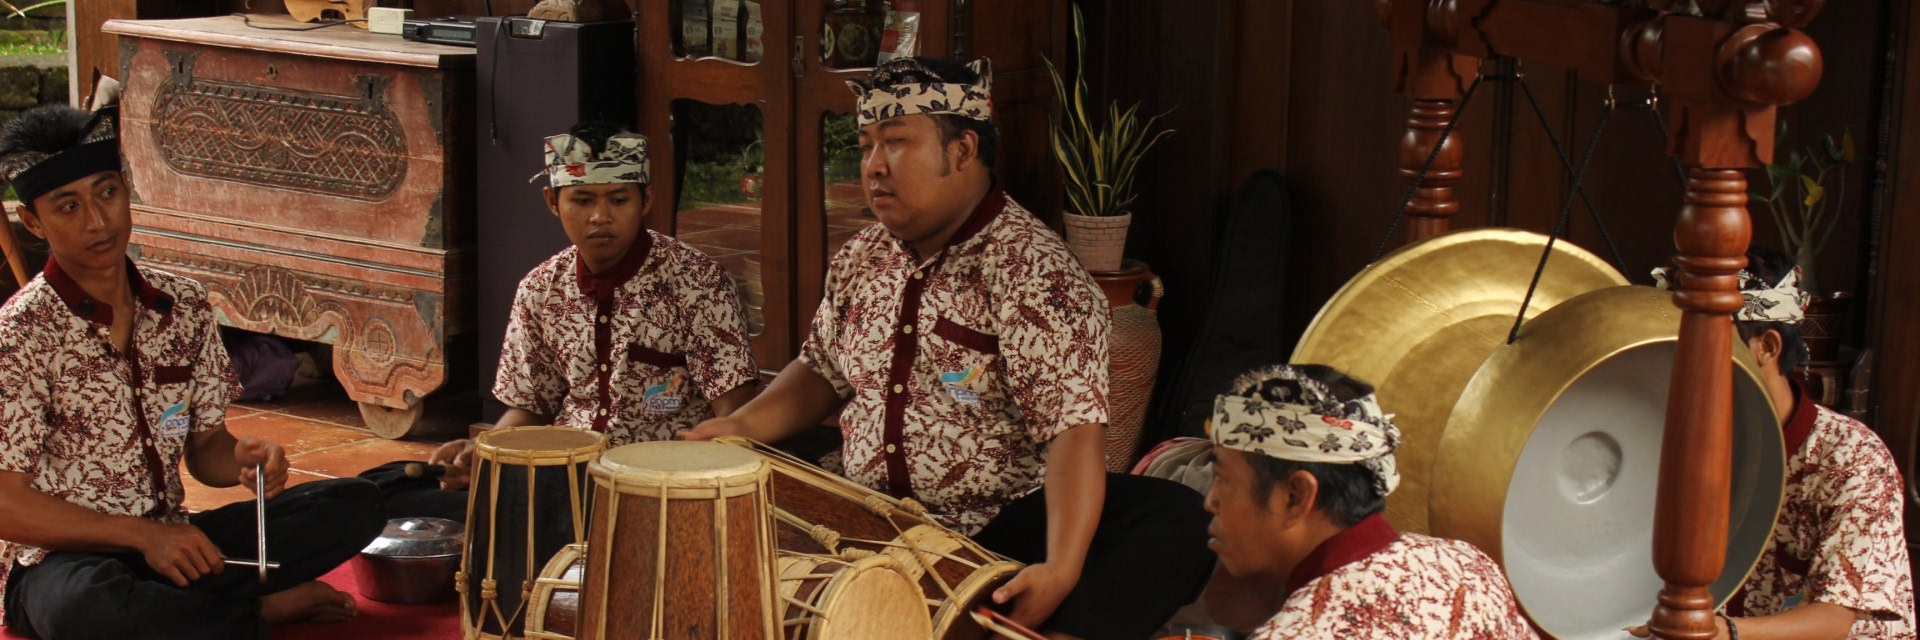 5 Tradisi Unik Suku Osing Banyuwangi Yang Masih Awet Hingga Saat Ini